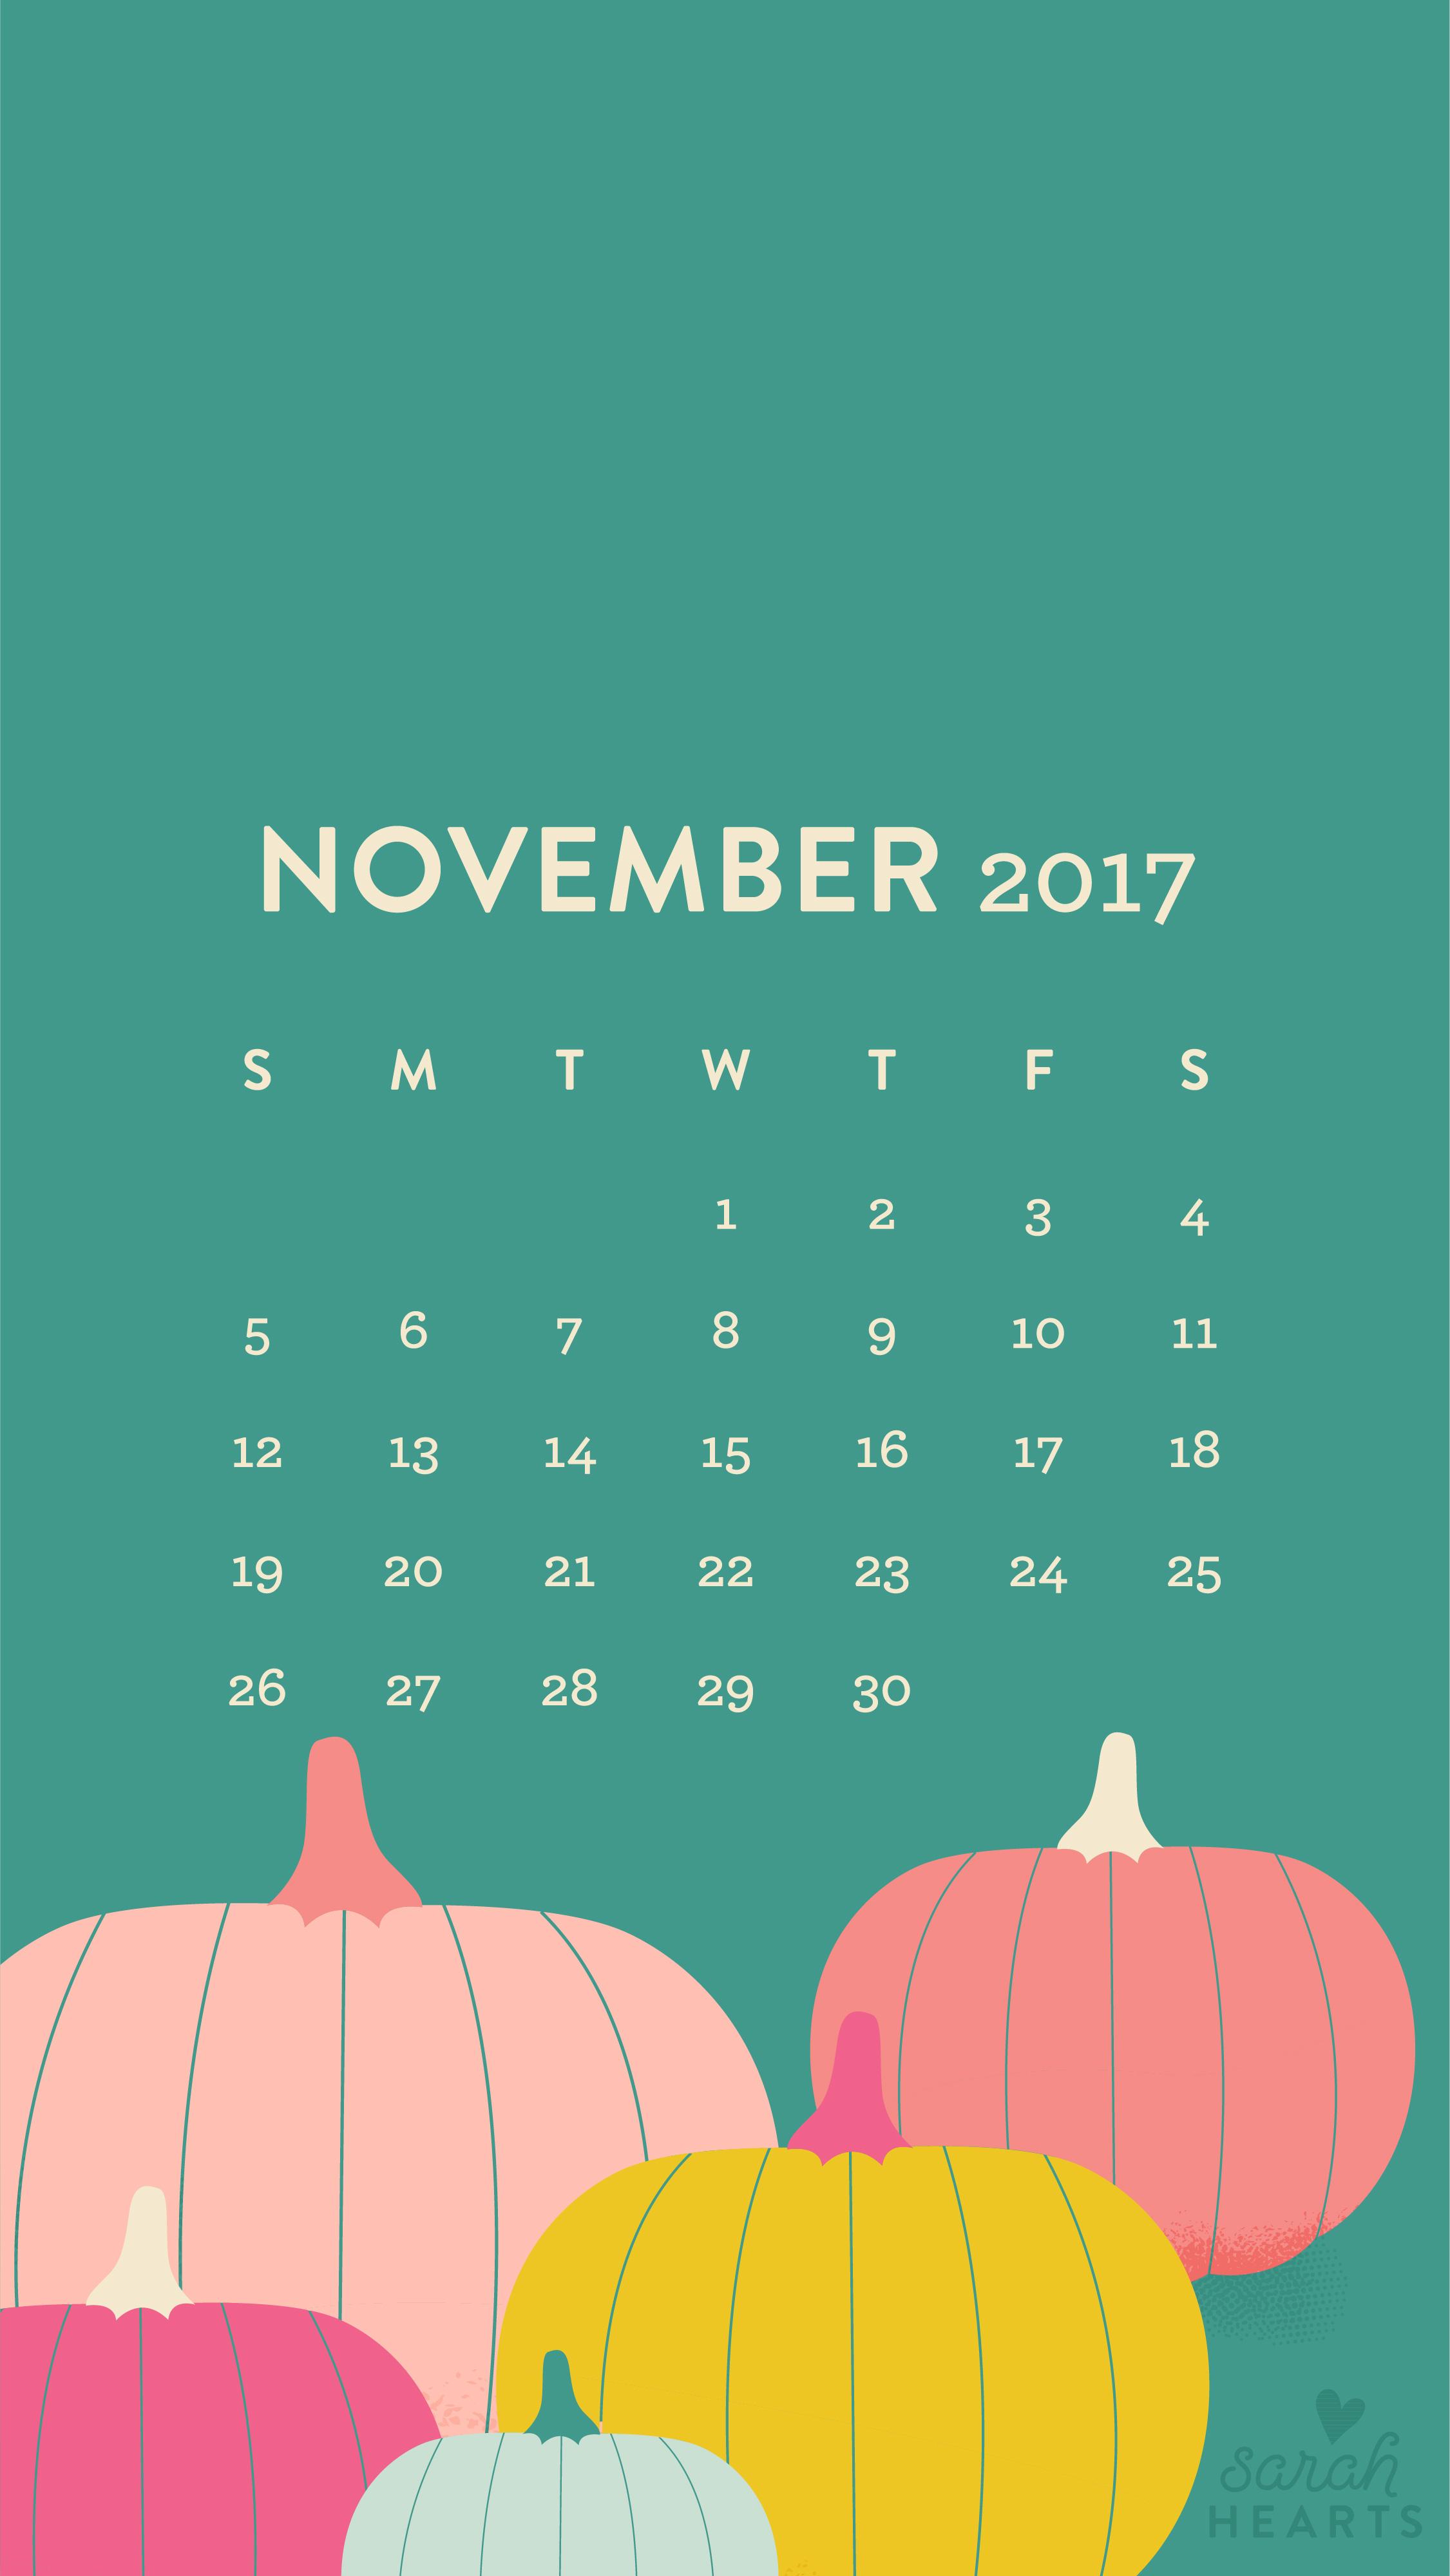 Fall Wallpaper For Laptop November 2017 Pumpkin Calendar Wallpaper Sarah Hearts